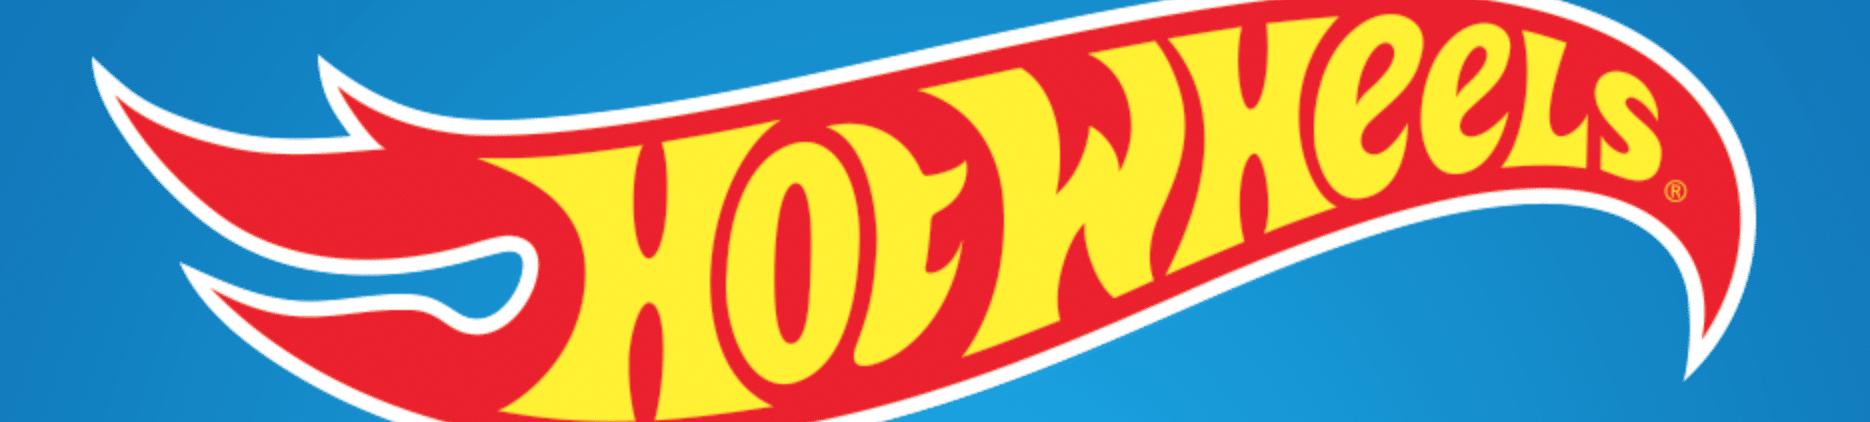 The History of the Hot Wheels Logo